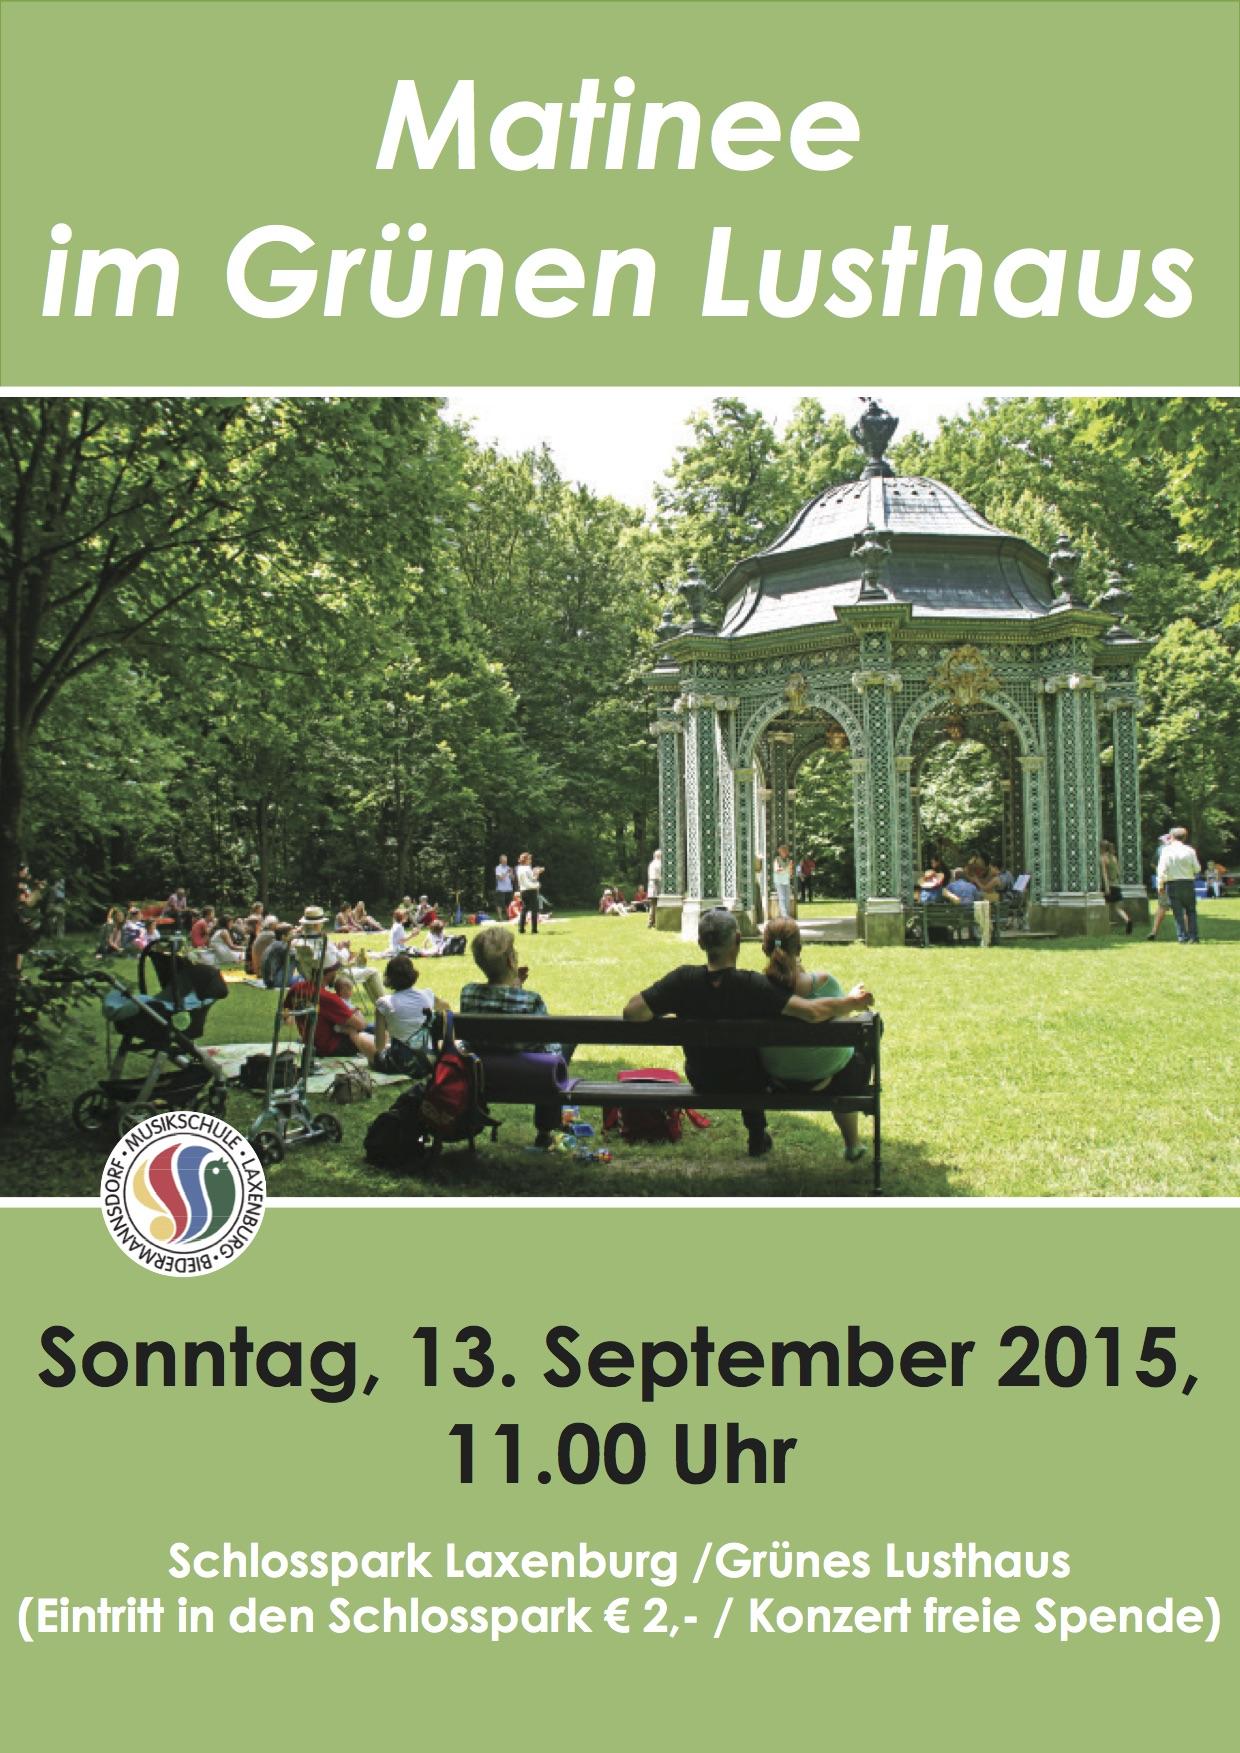 Matinee im Schlosspark-Plakat – September 2015